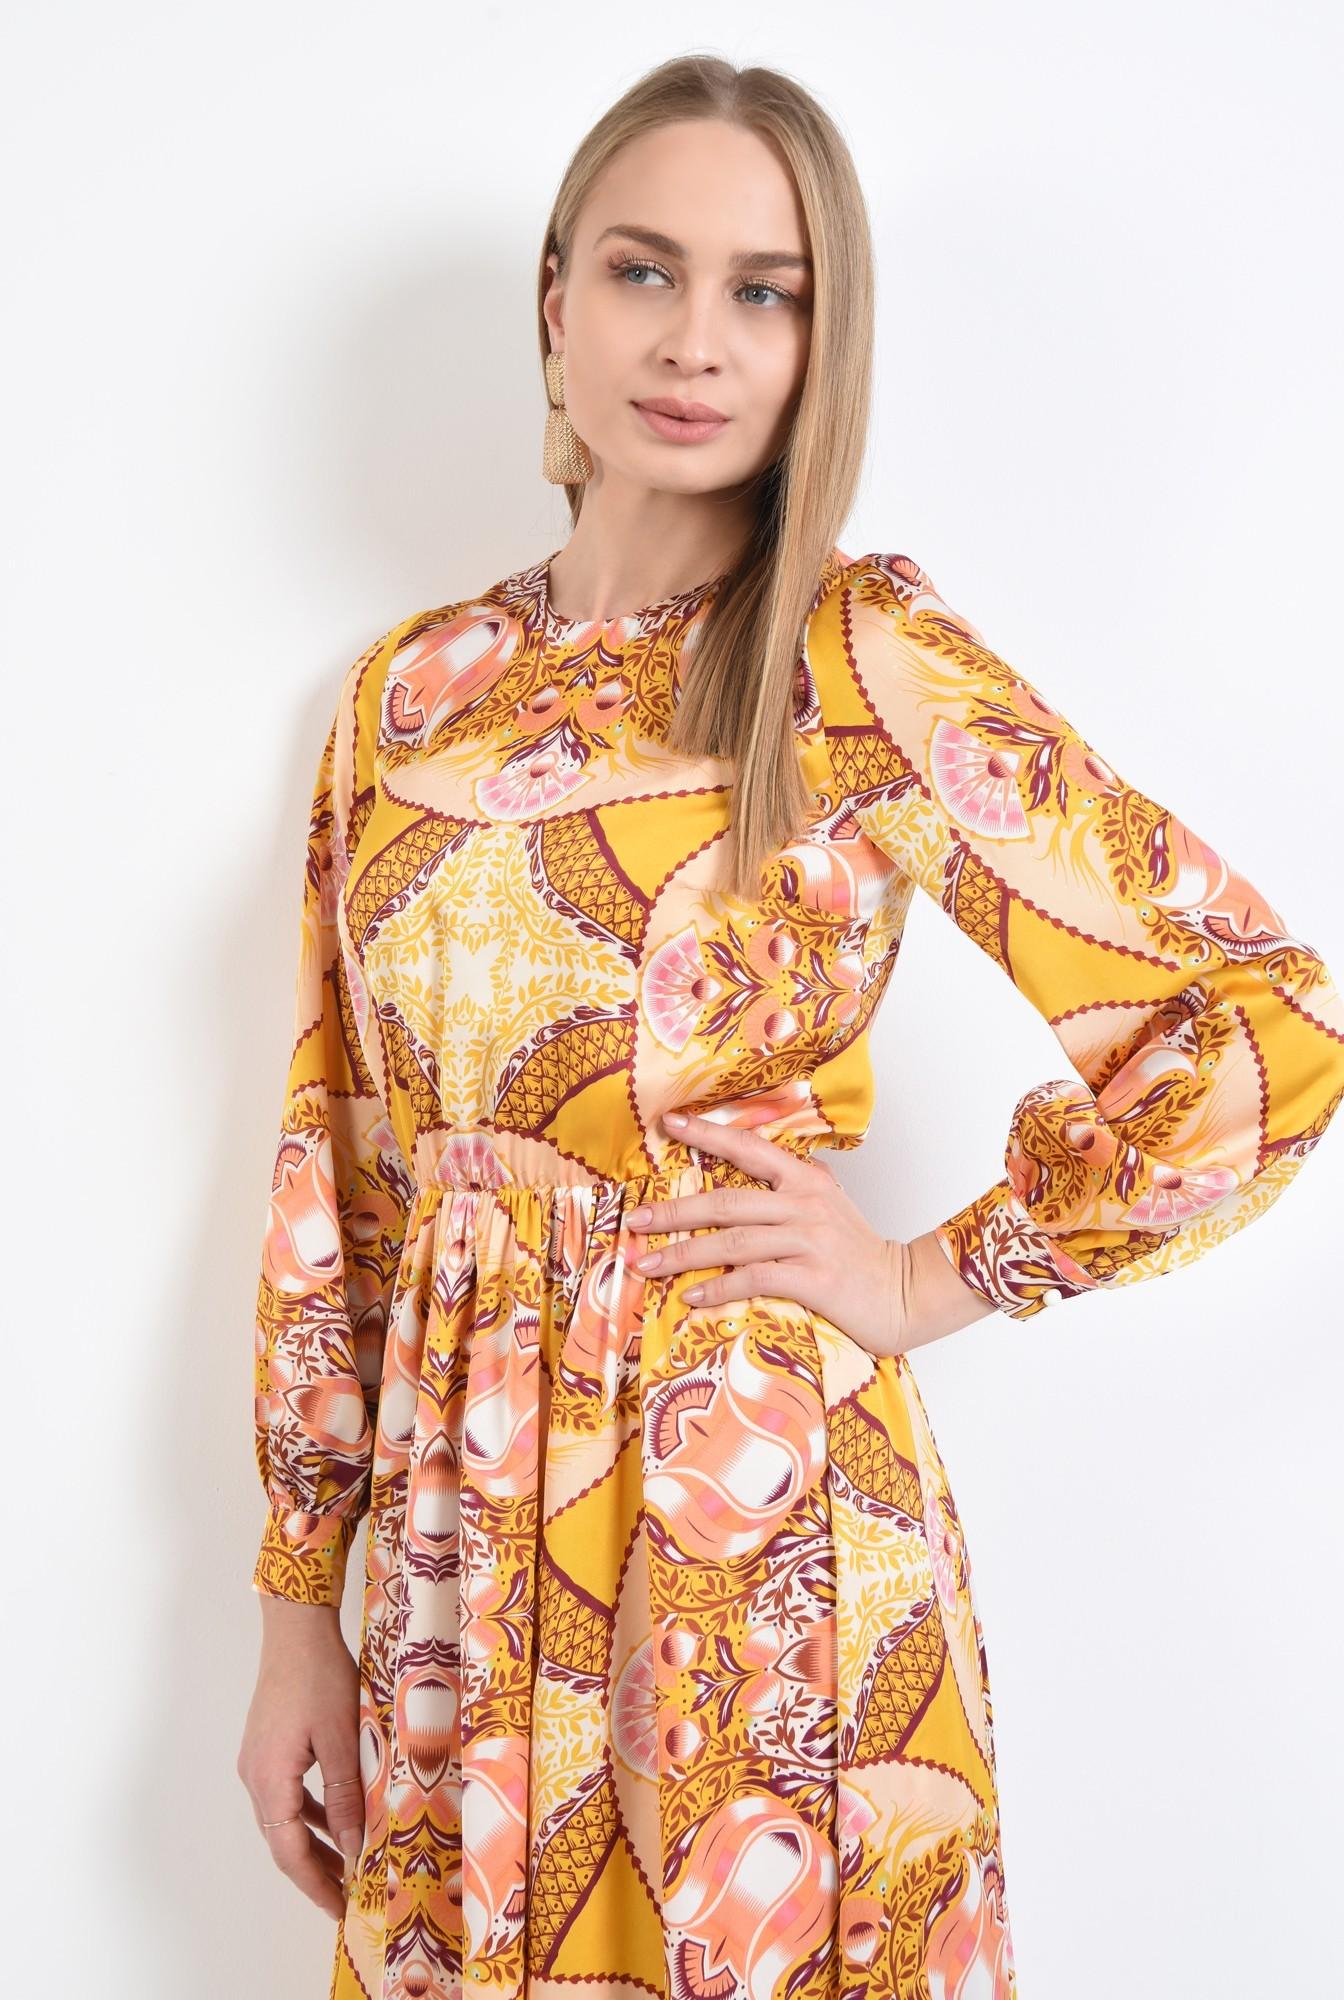 2 - 360 - rochie imprimata, midi, croi pe bie, galben mustar, imprimeu abstract